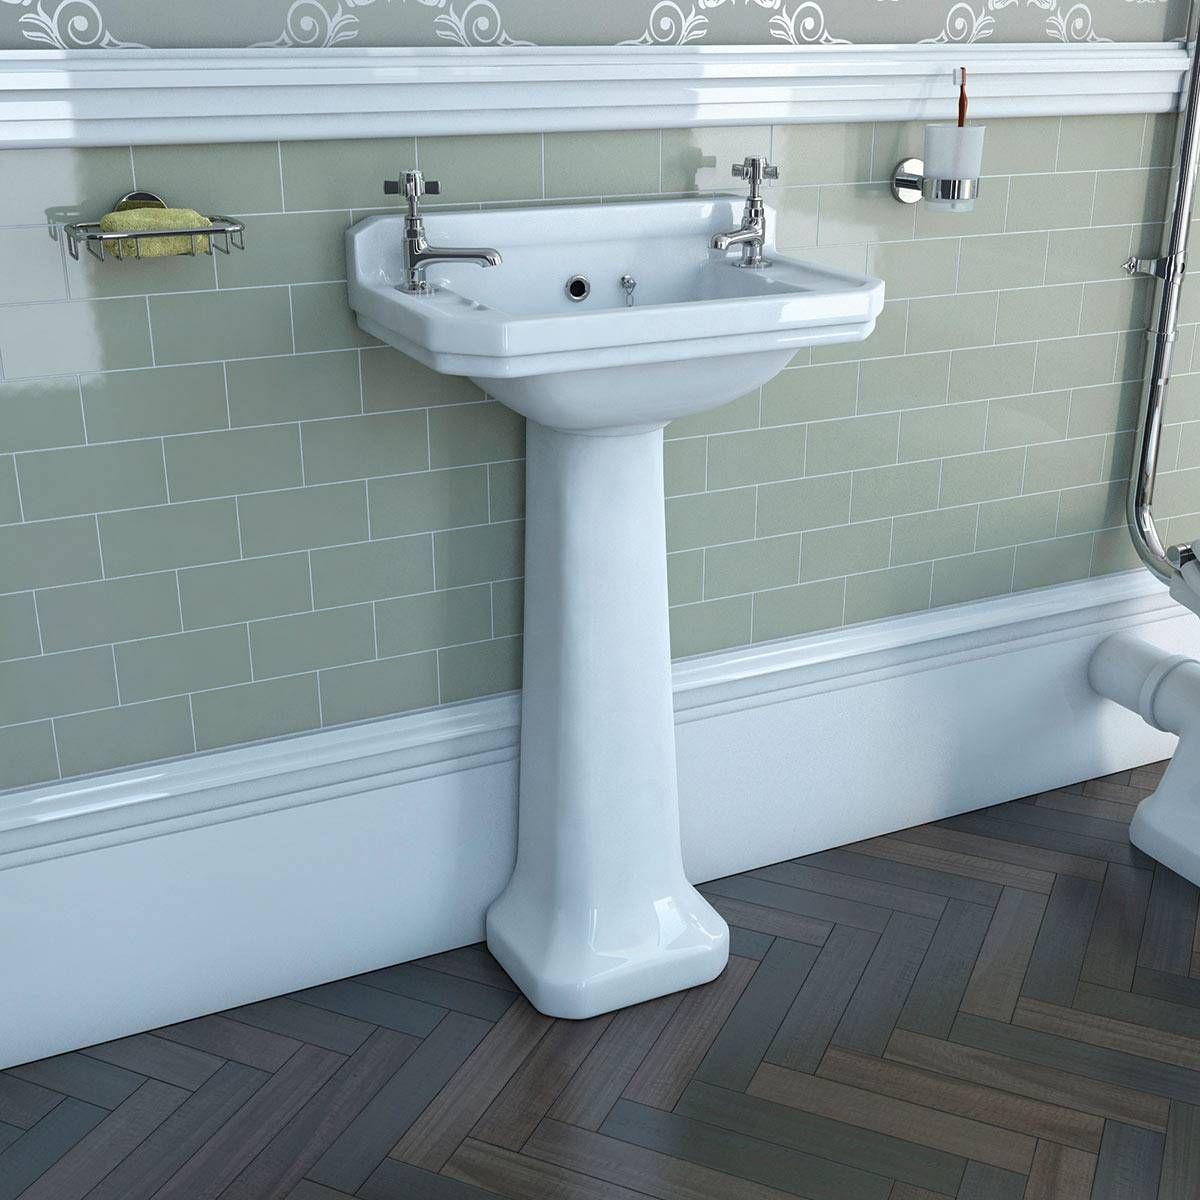 Camberley 2th cloakroom basin pedestal victoria plumb for Bathroom cabinets victoria plumb